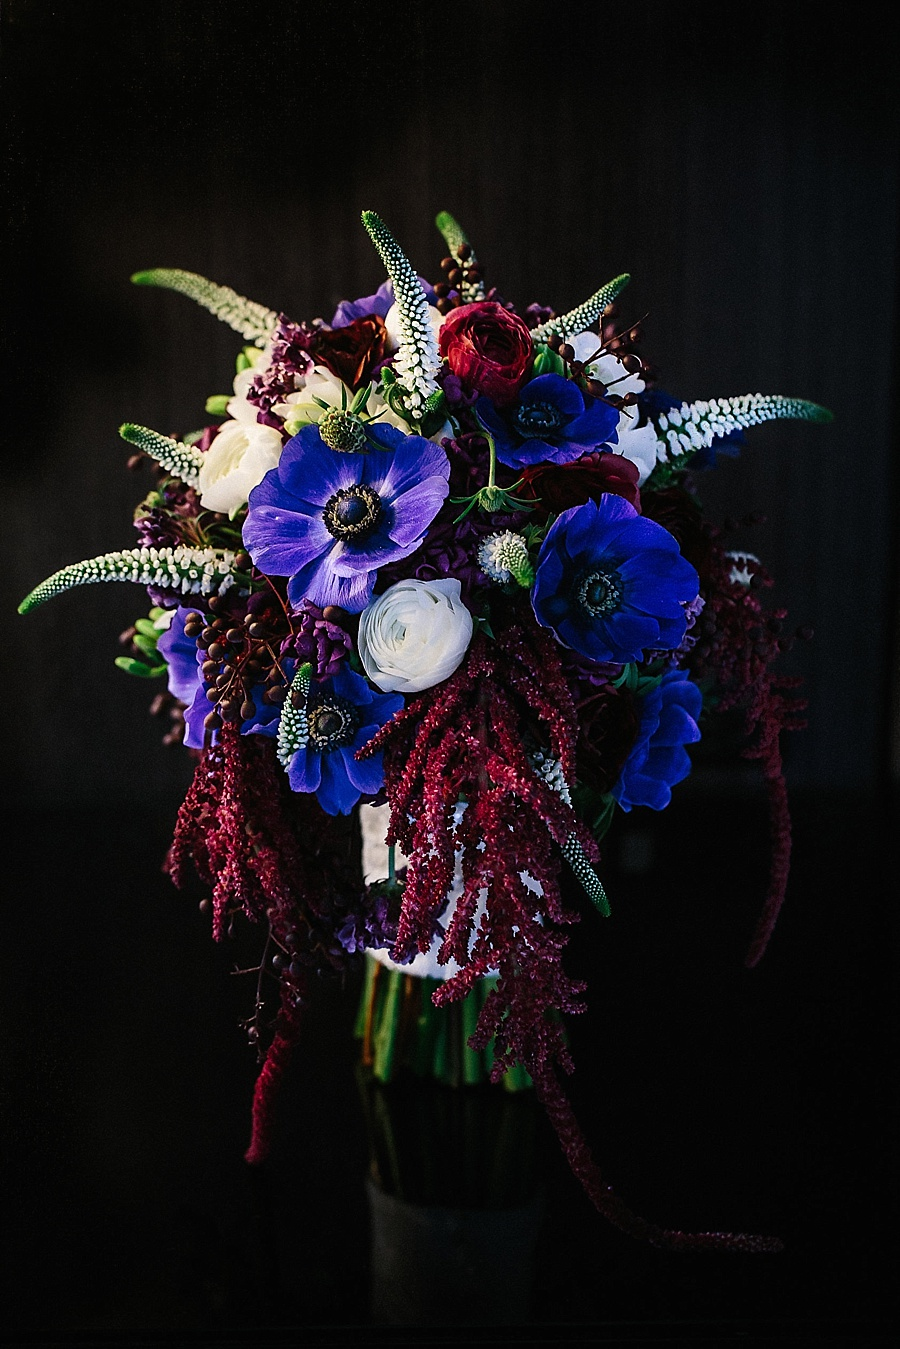 Karmapants_Photography_April_Lynn_Designs_Ballroom_at_the_Ben_Finley_Catering_Luxe_Elegant_Wedding_Art_Deco_Gatsby_Gold_Black_Details-62